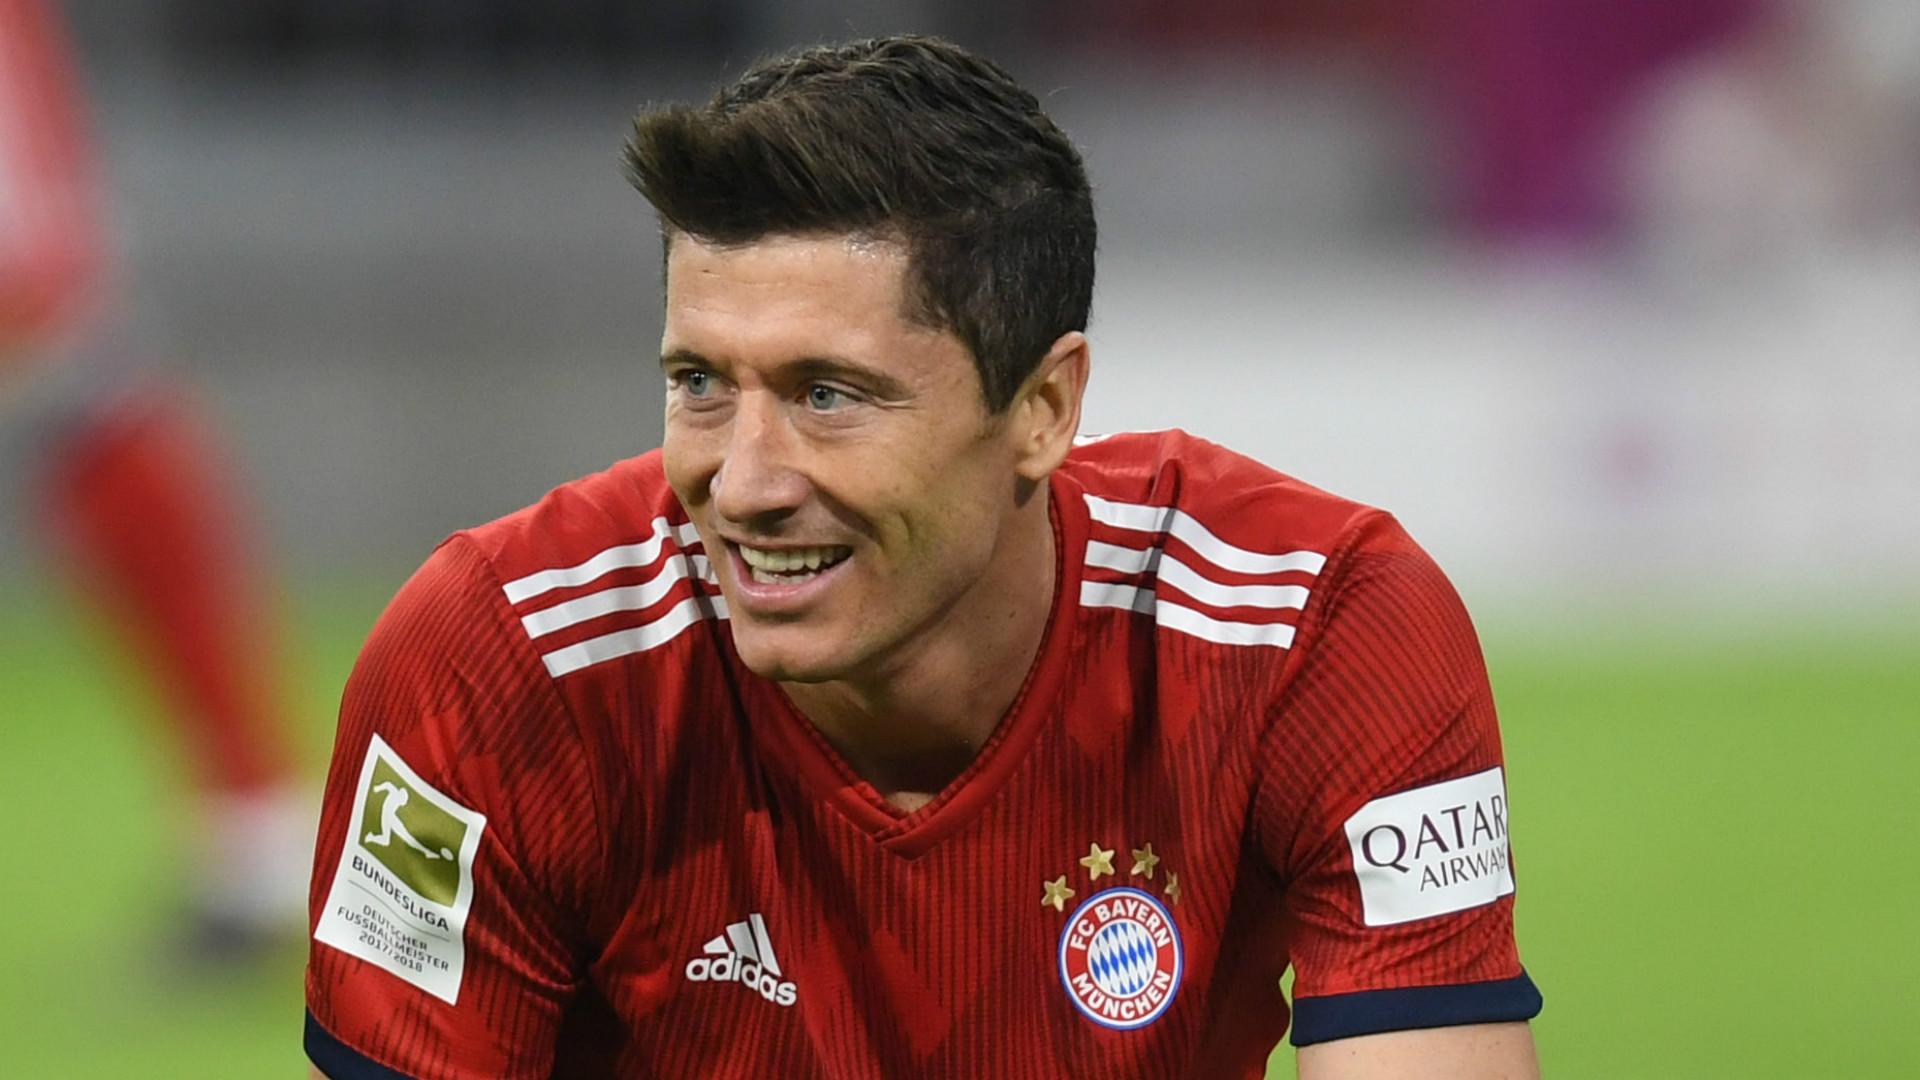 Man Utd legend tips striker signing amid Lewandowski & Dybala links